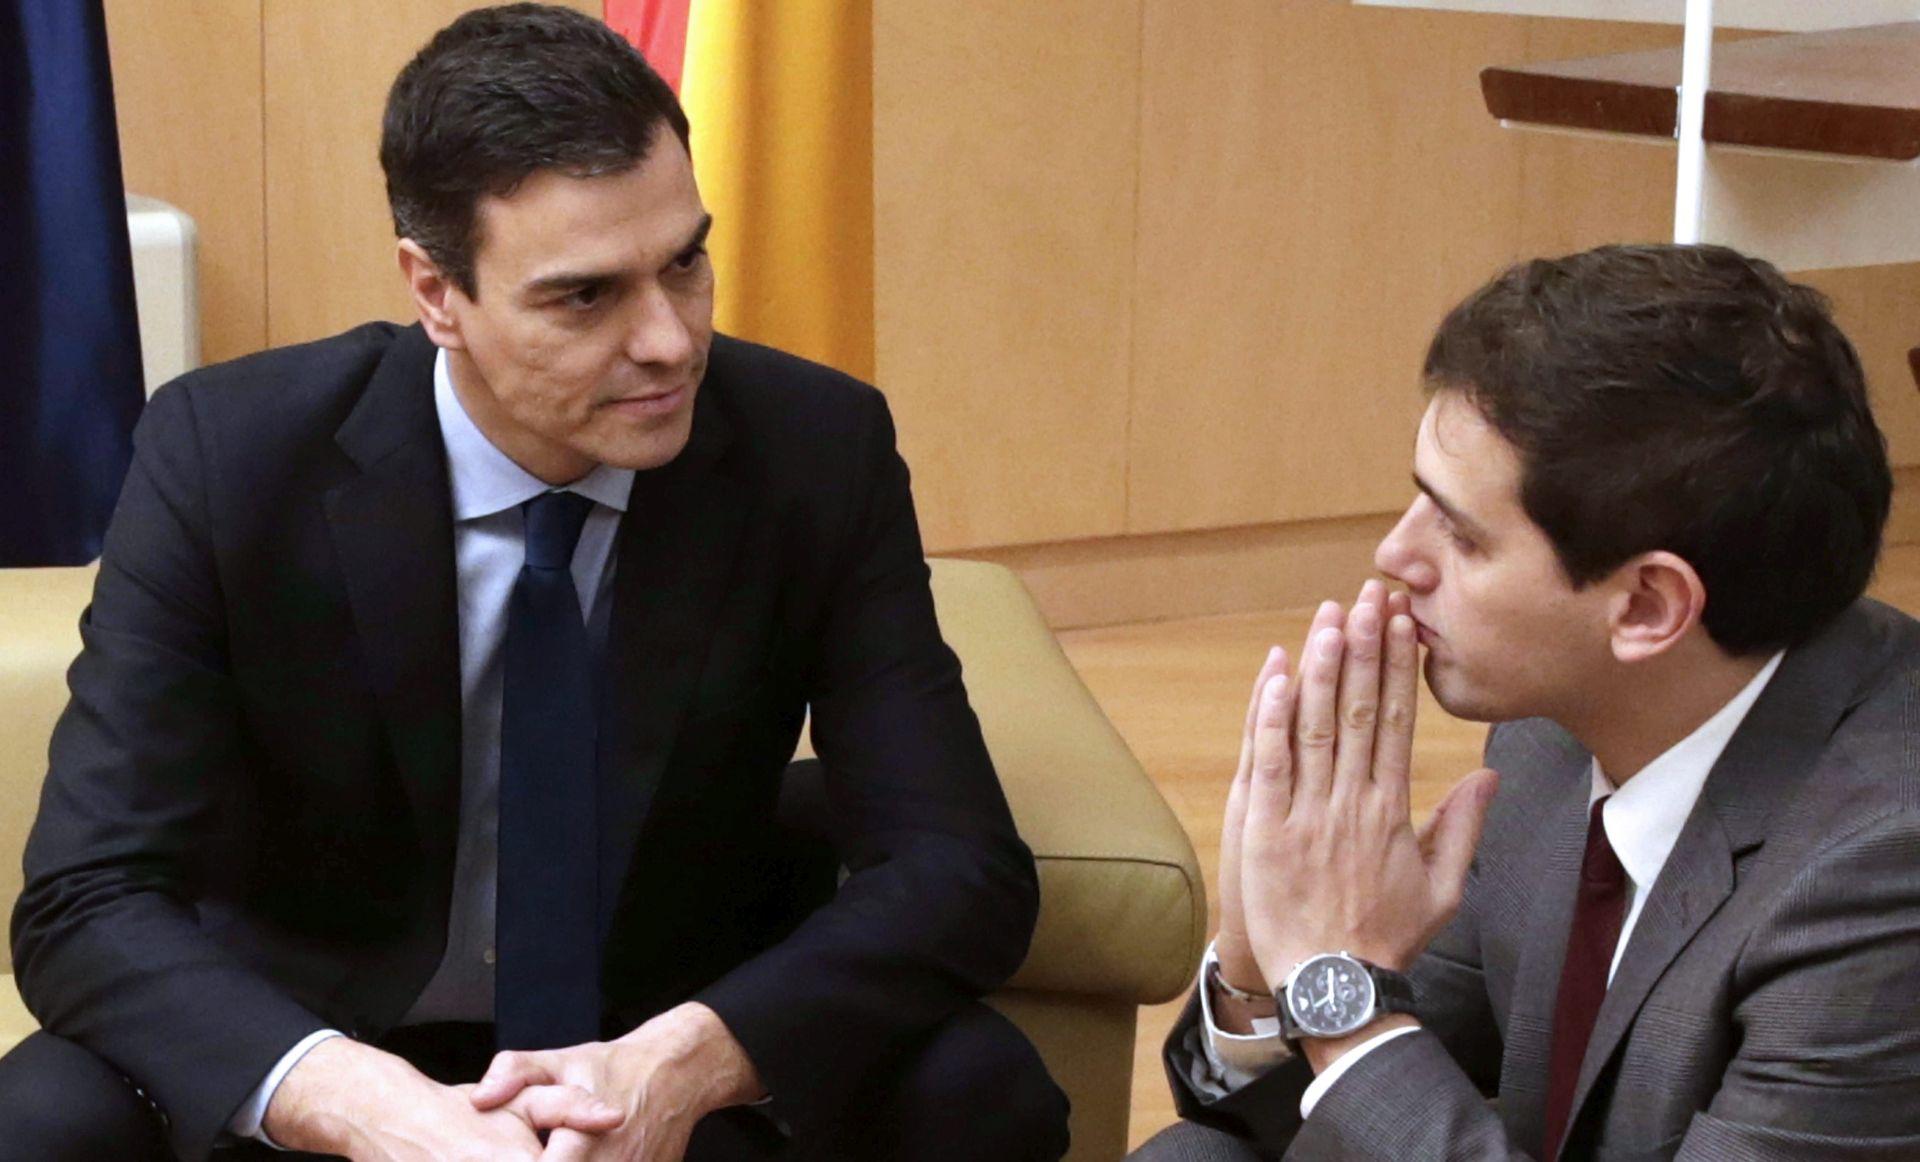 BEZ PODRŠKE: Parlament odbio Sáncheza, Španjolska i dalje bez vlade